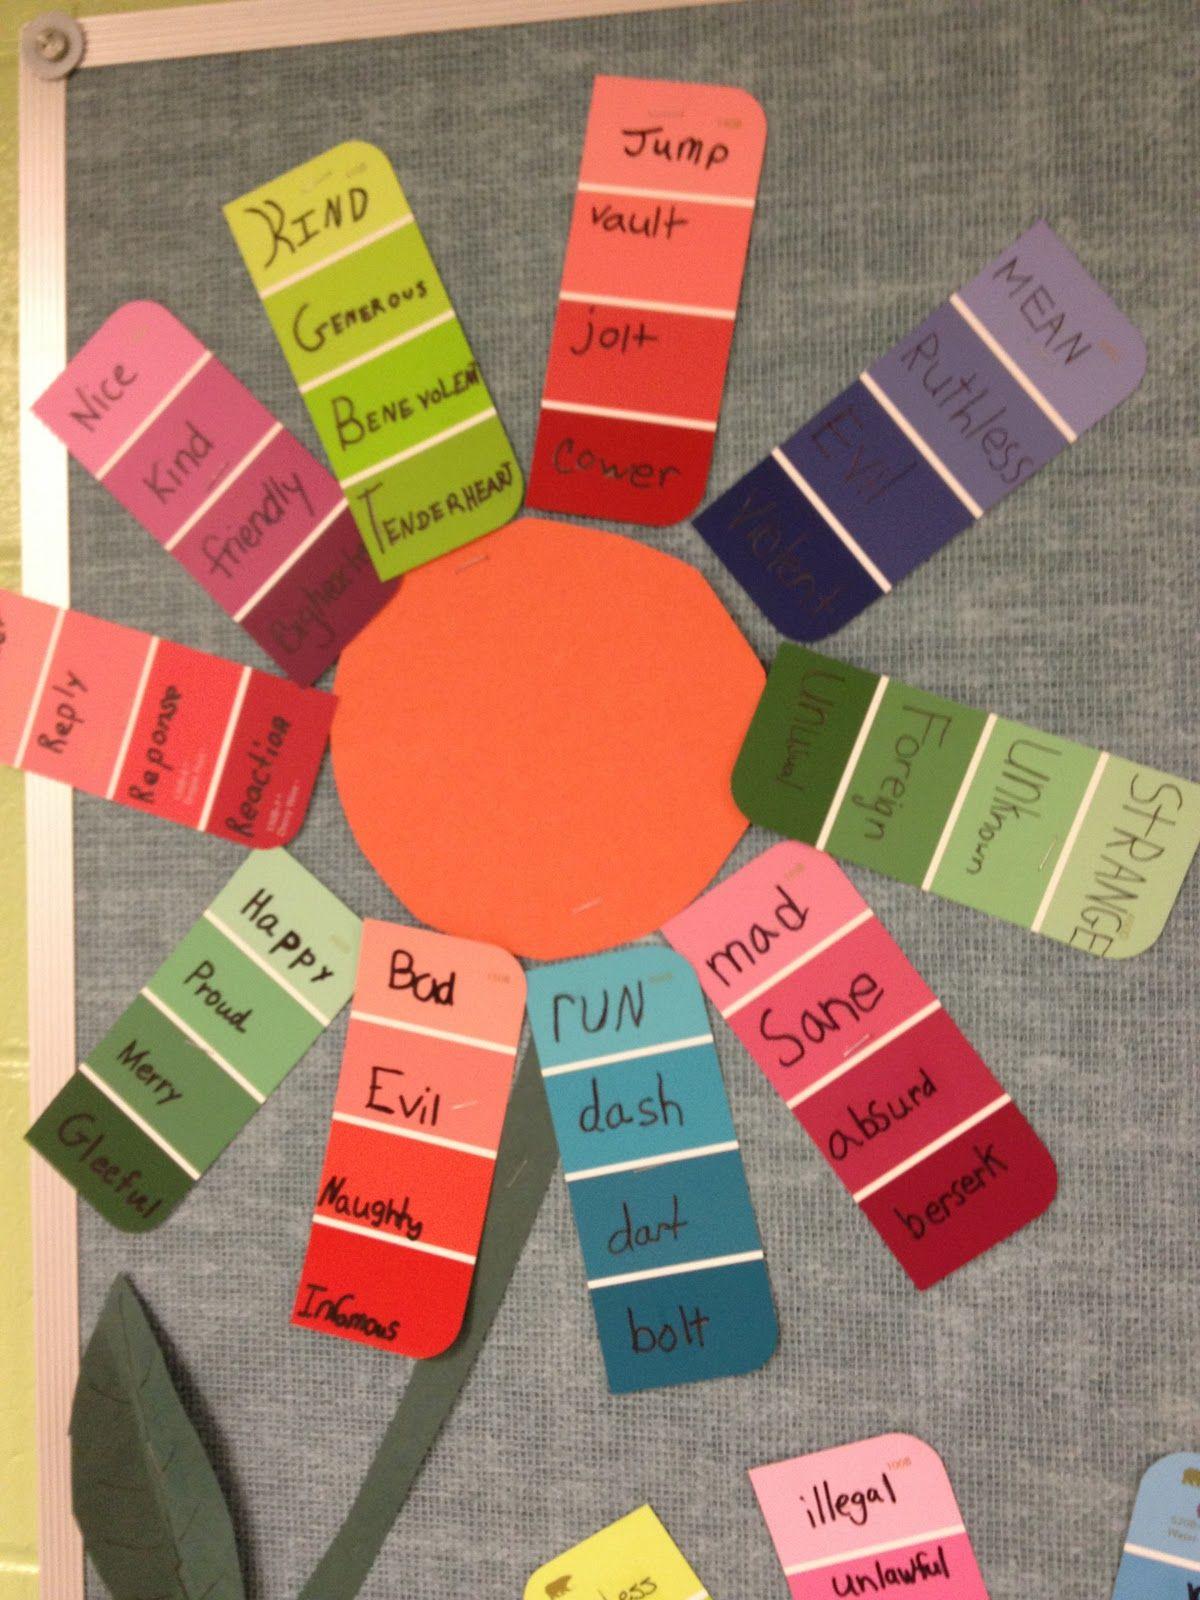 8 writing ideas from Pinterest  Gardens Feelings words